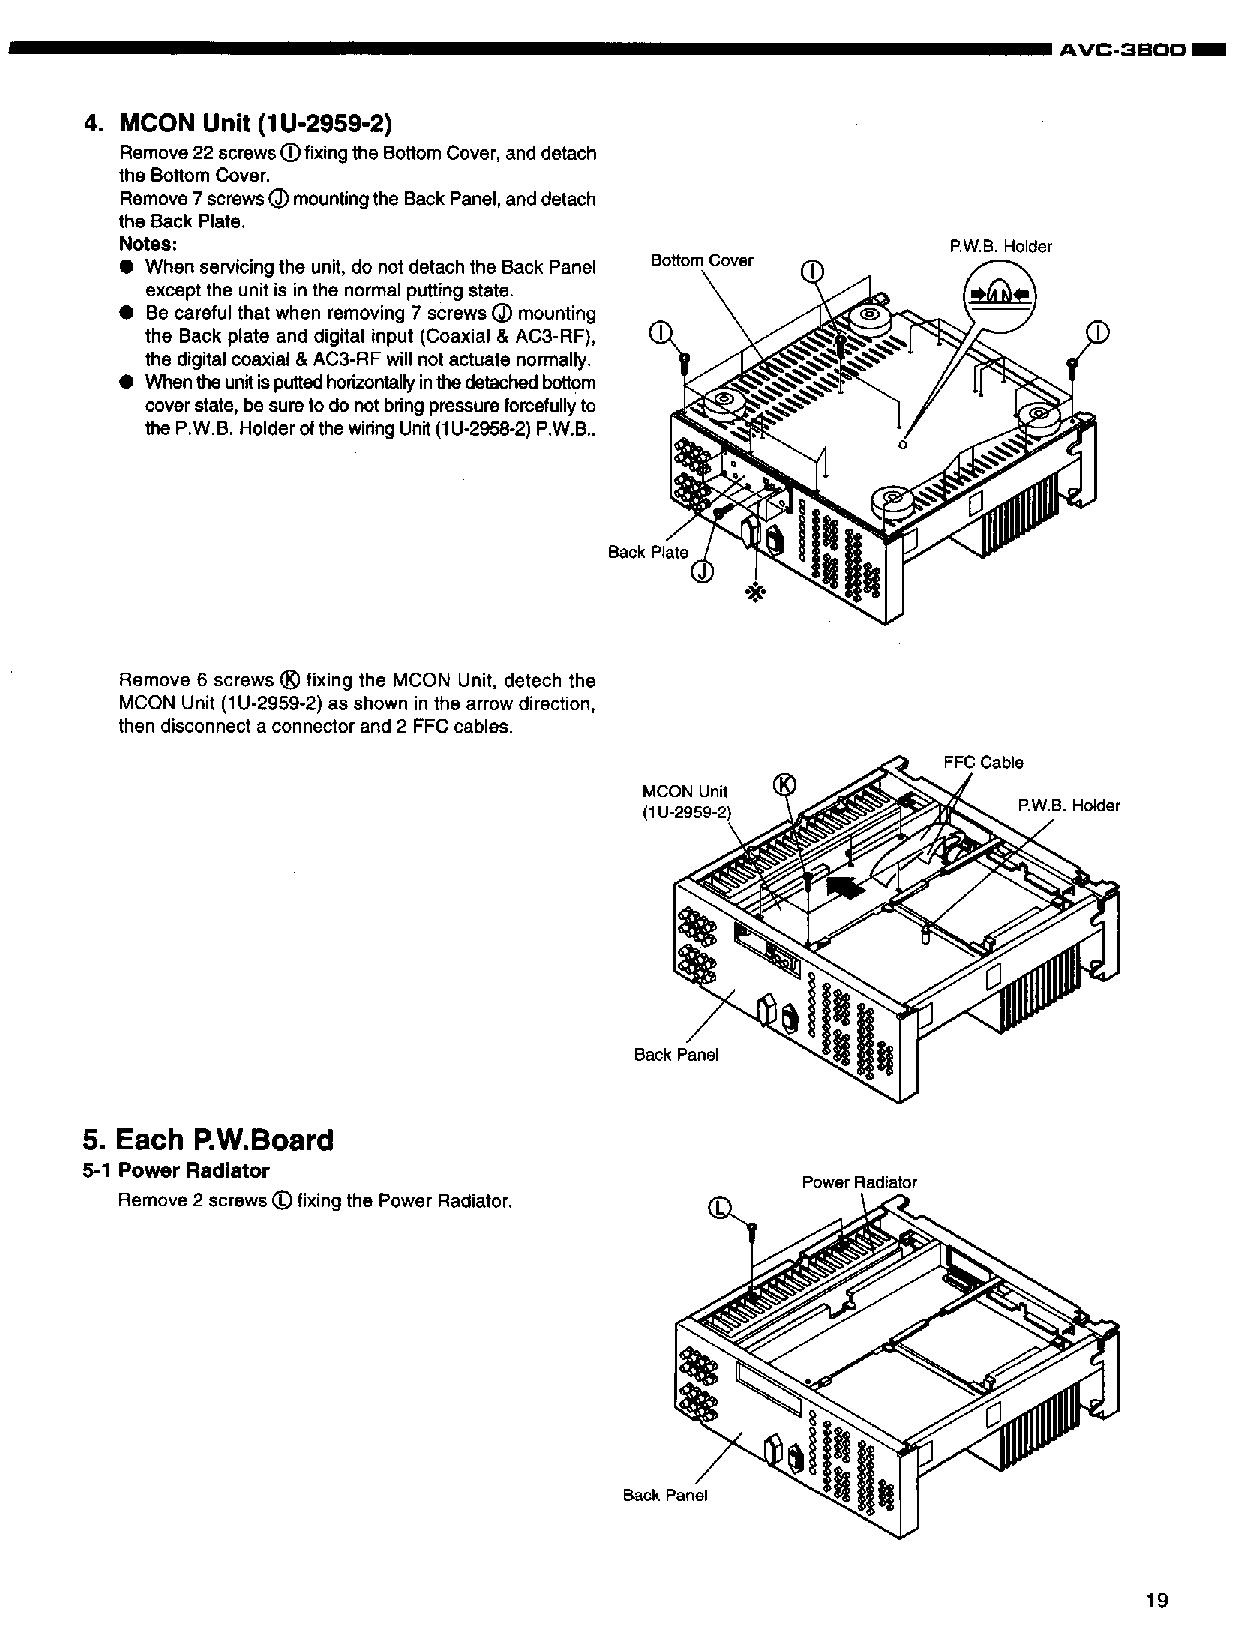 Denon AVC-3800 Service Manual